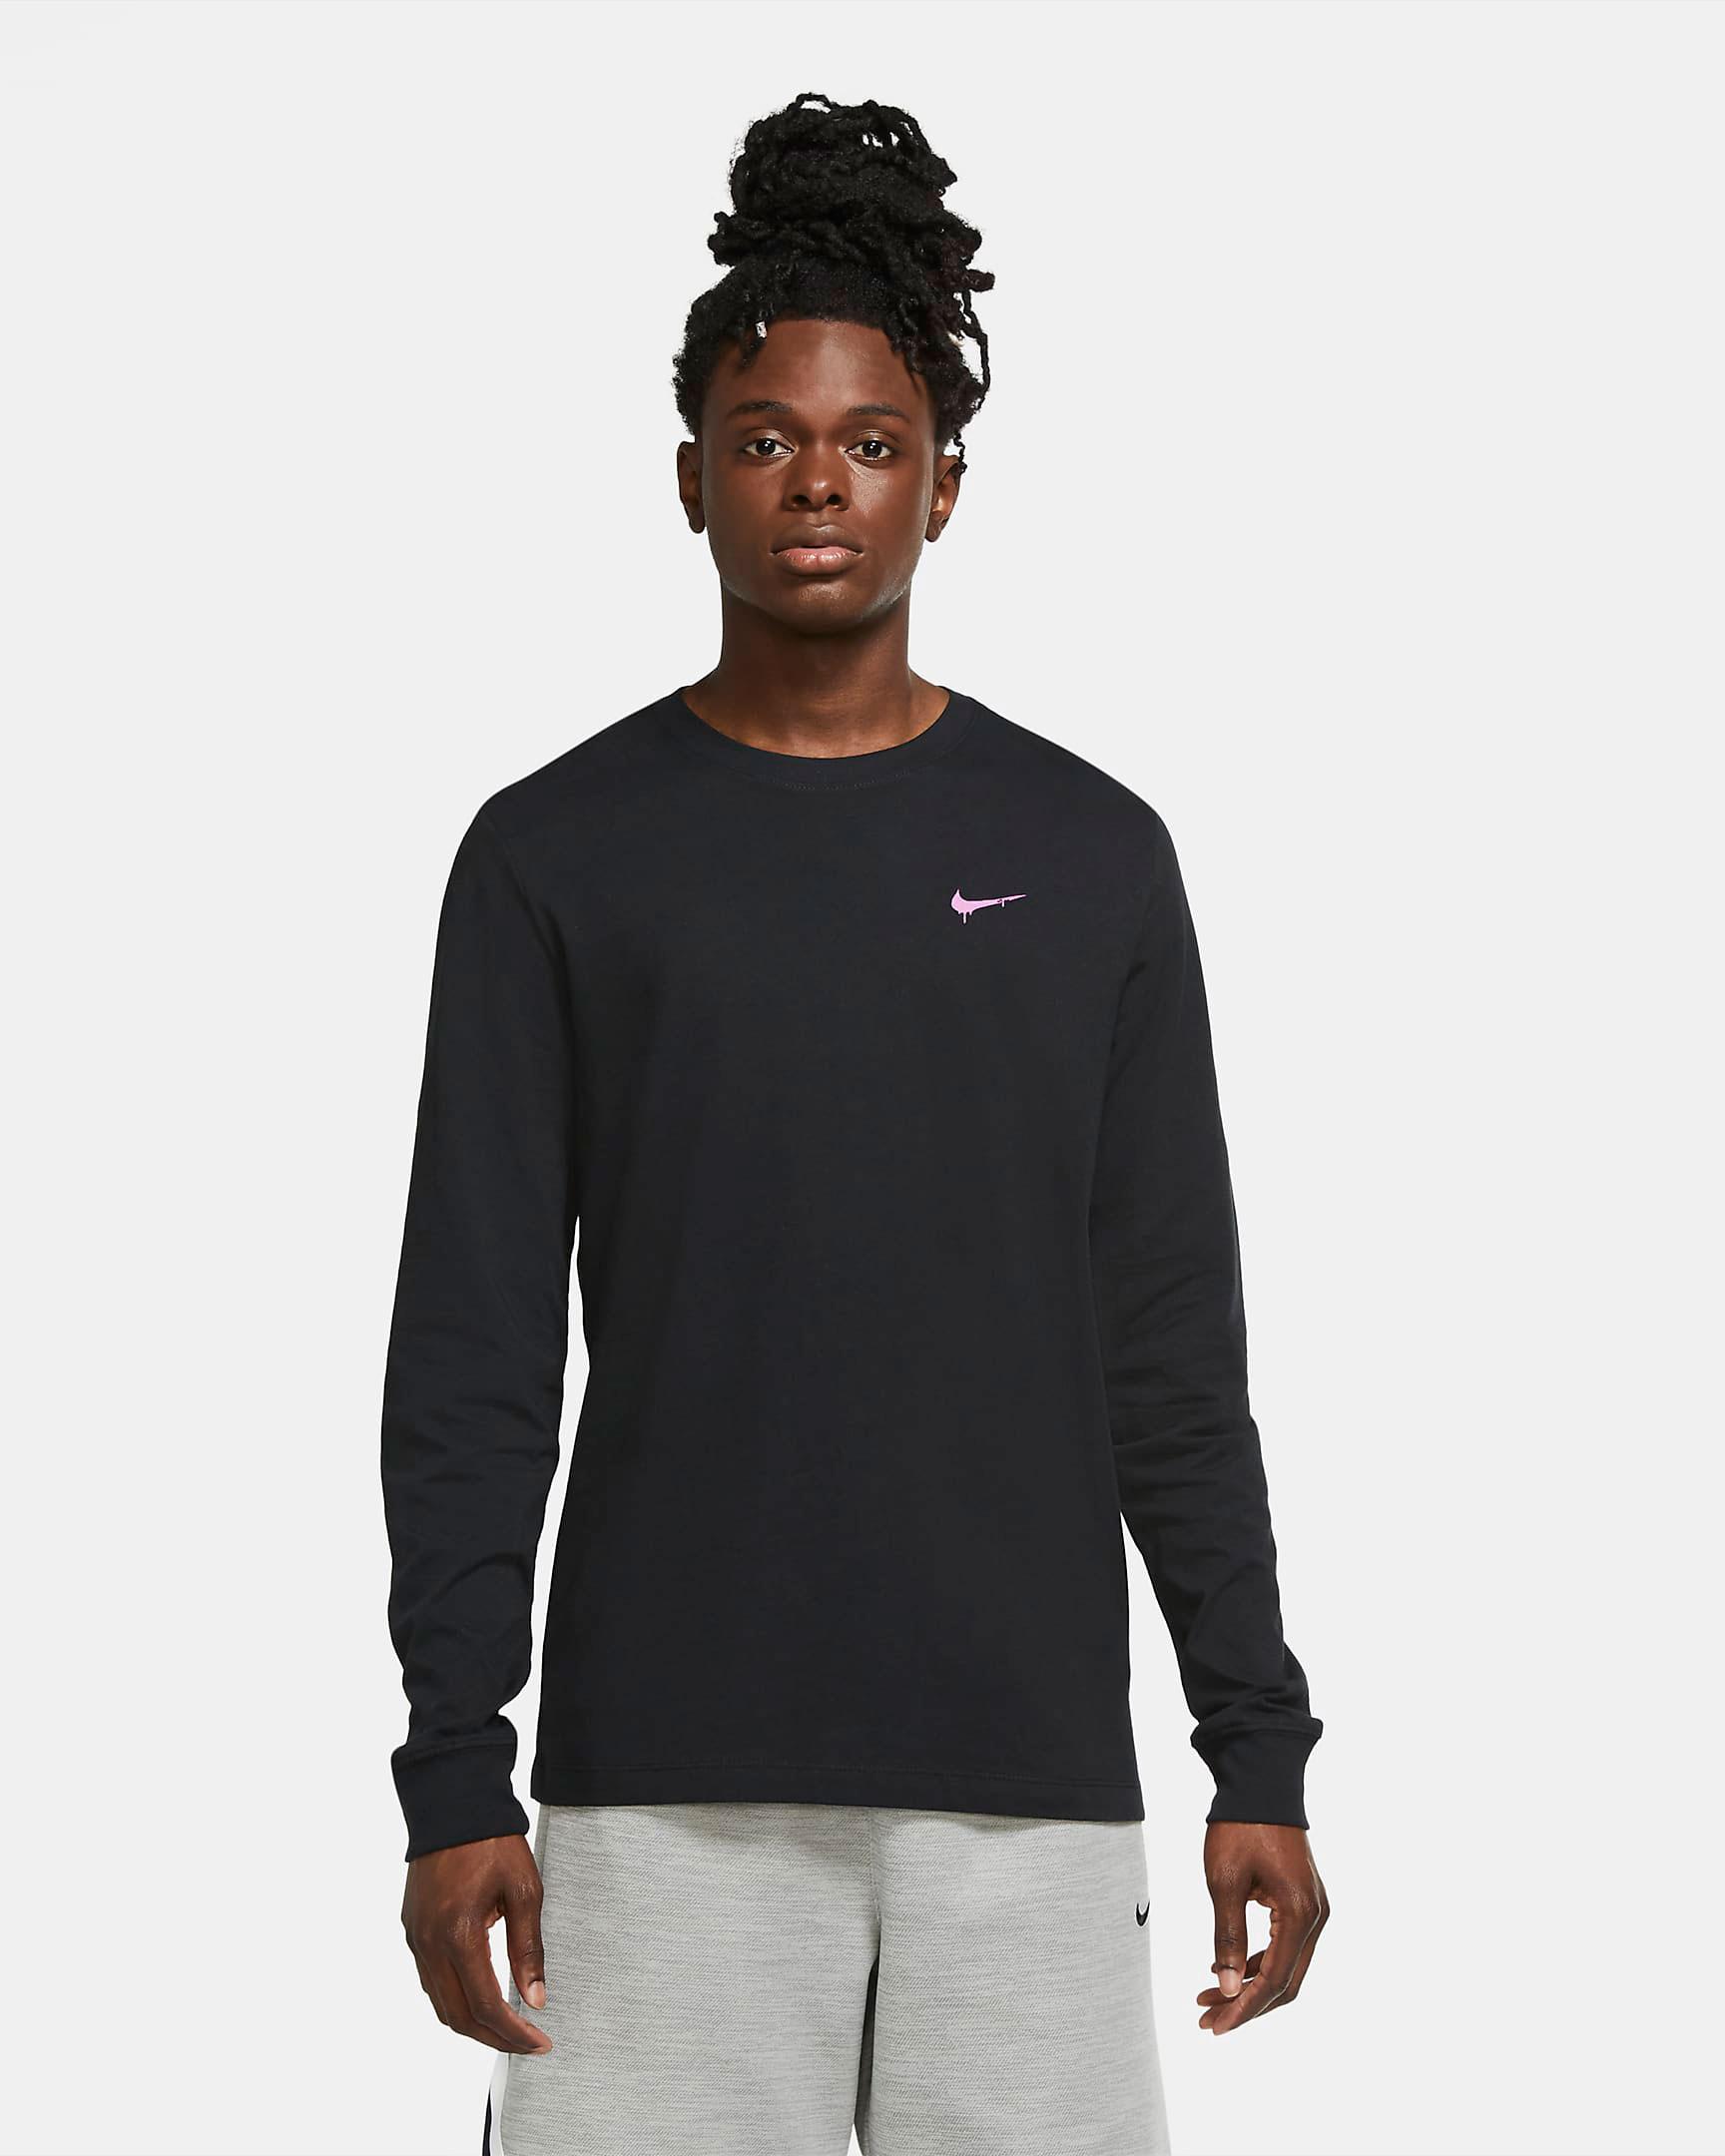 nike-peace-love-basketball-long-sleeve-shirt-black-1